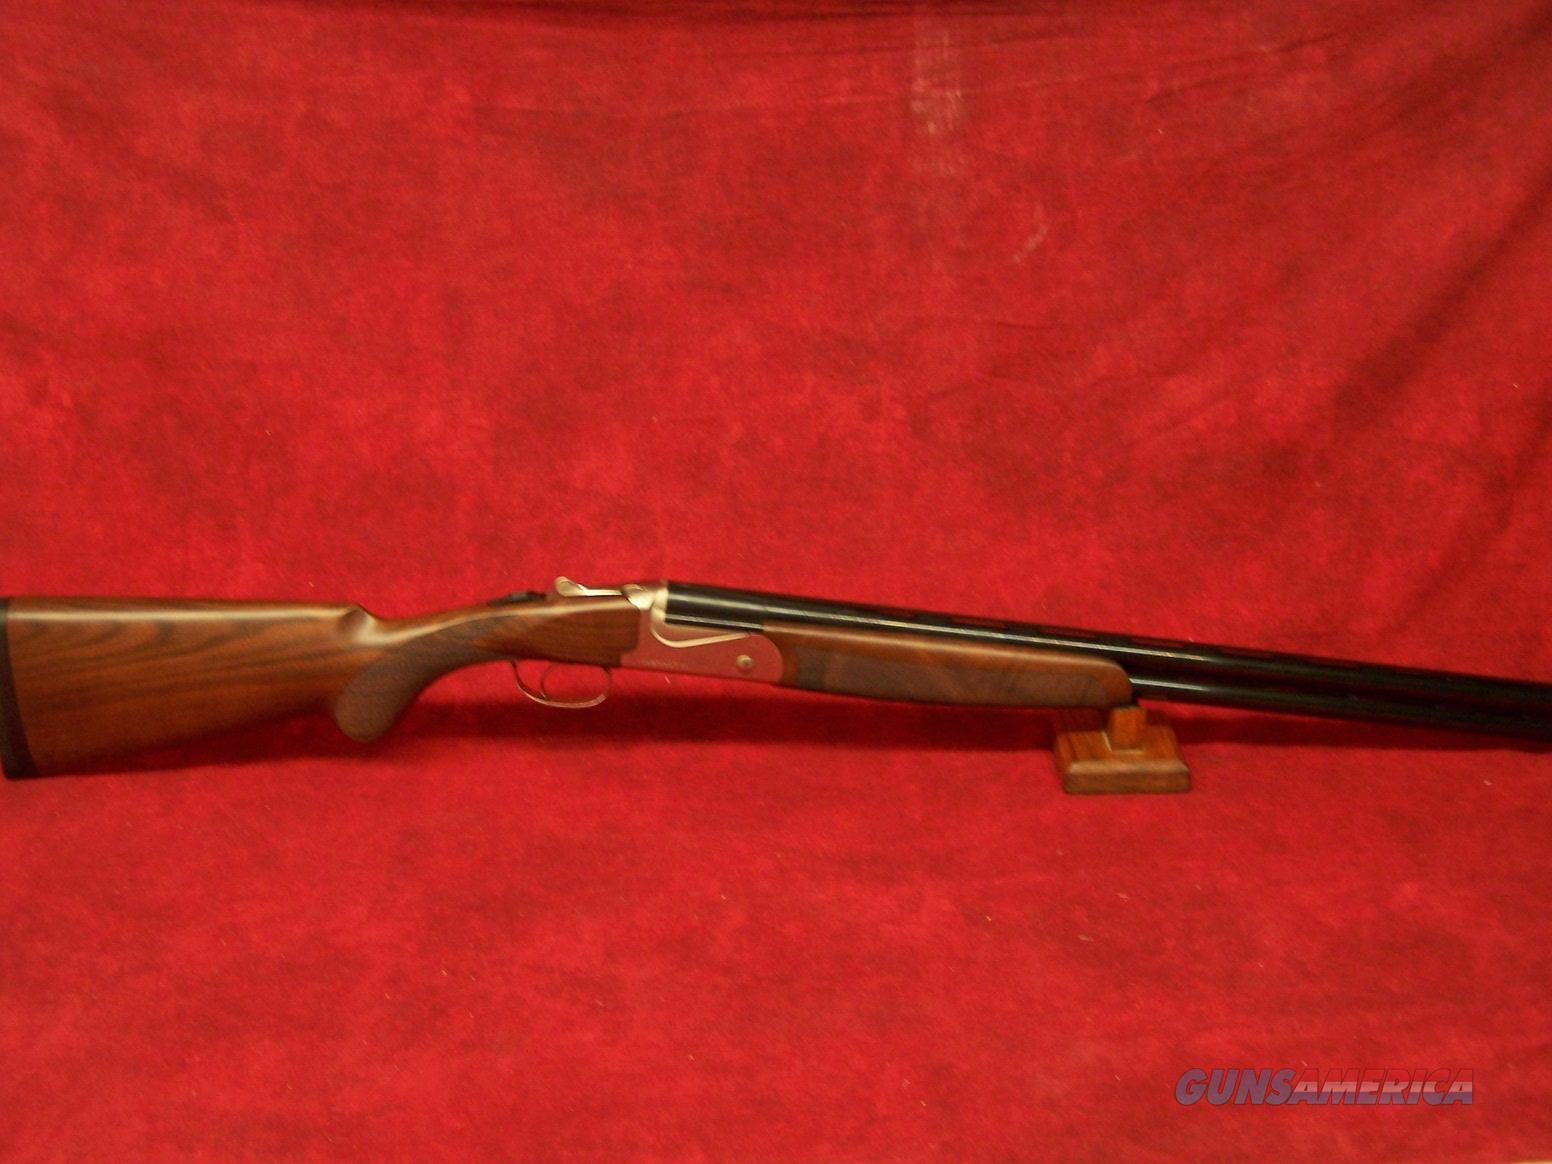 "Franchi Instinct SL 20ga 26"" Barrel (40830)  Guns > Shotguns > Franchi Shotguns > Over/Under > Hunting"